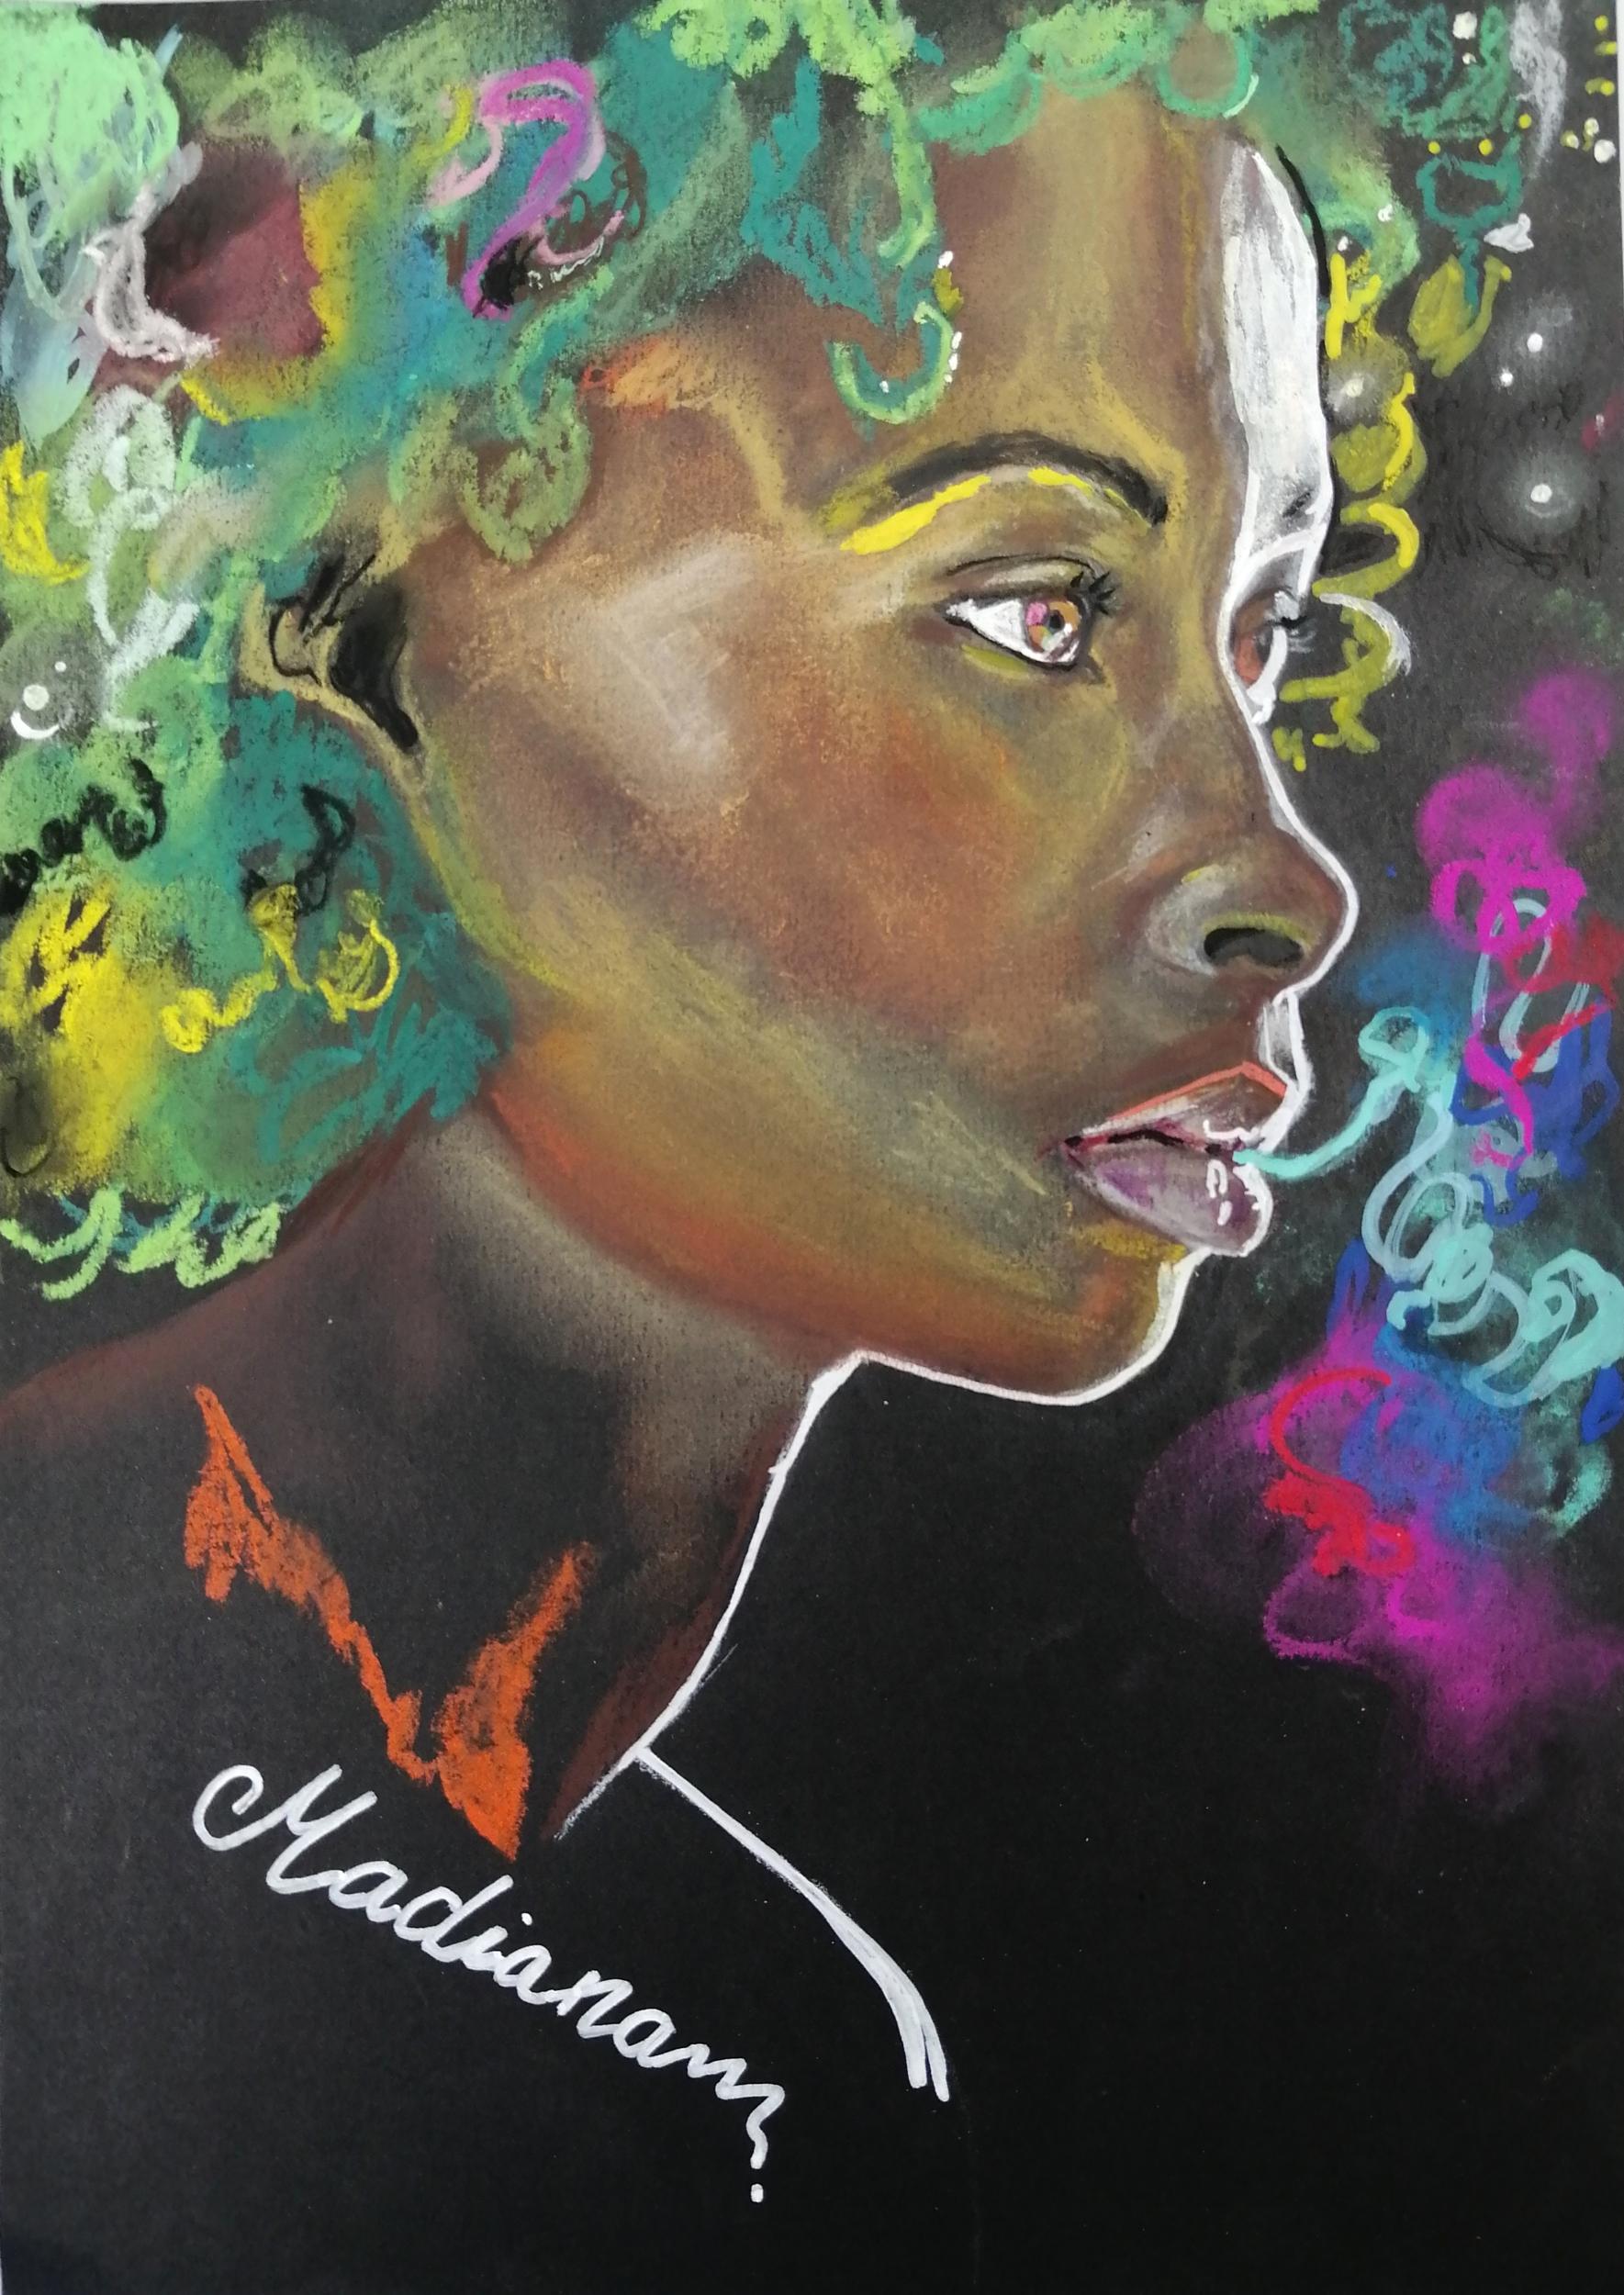 dessin art contemporain femme noire multicolore